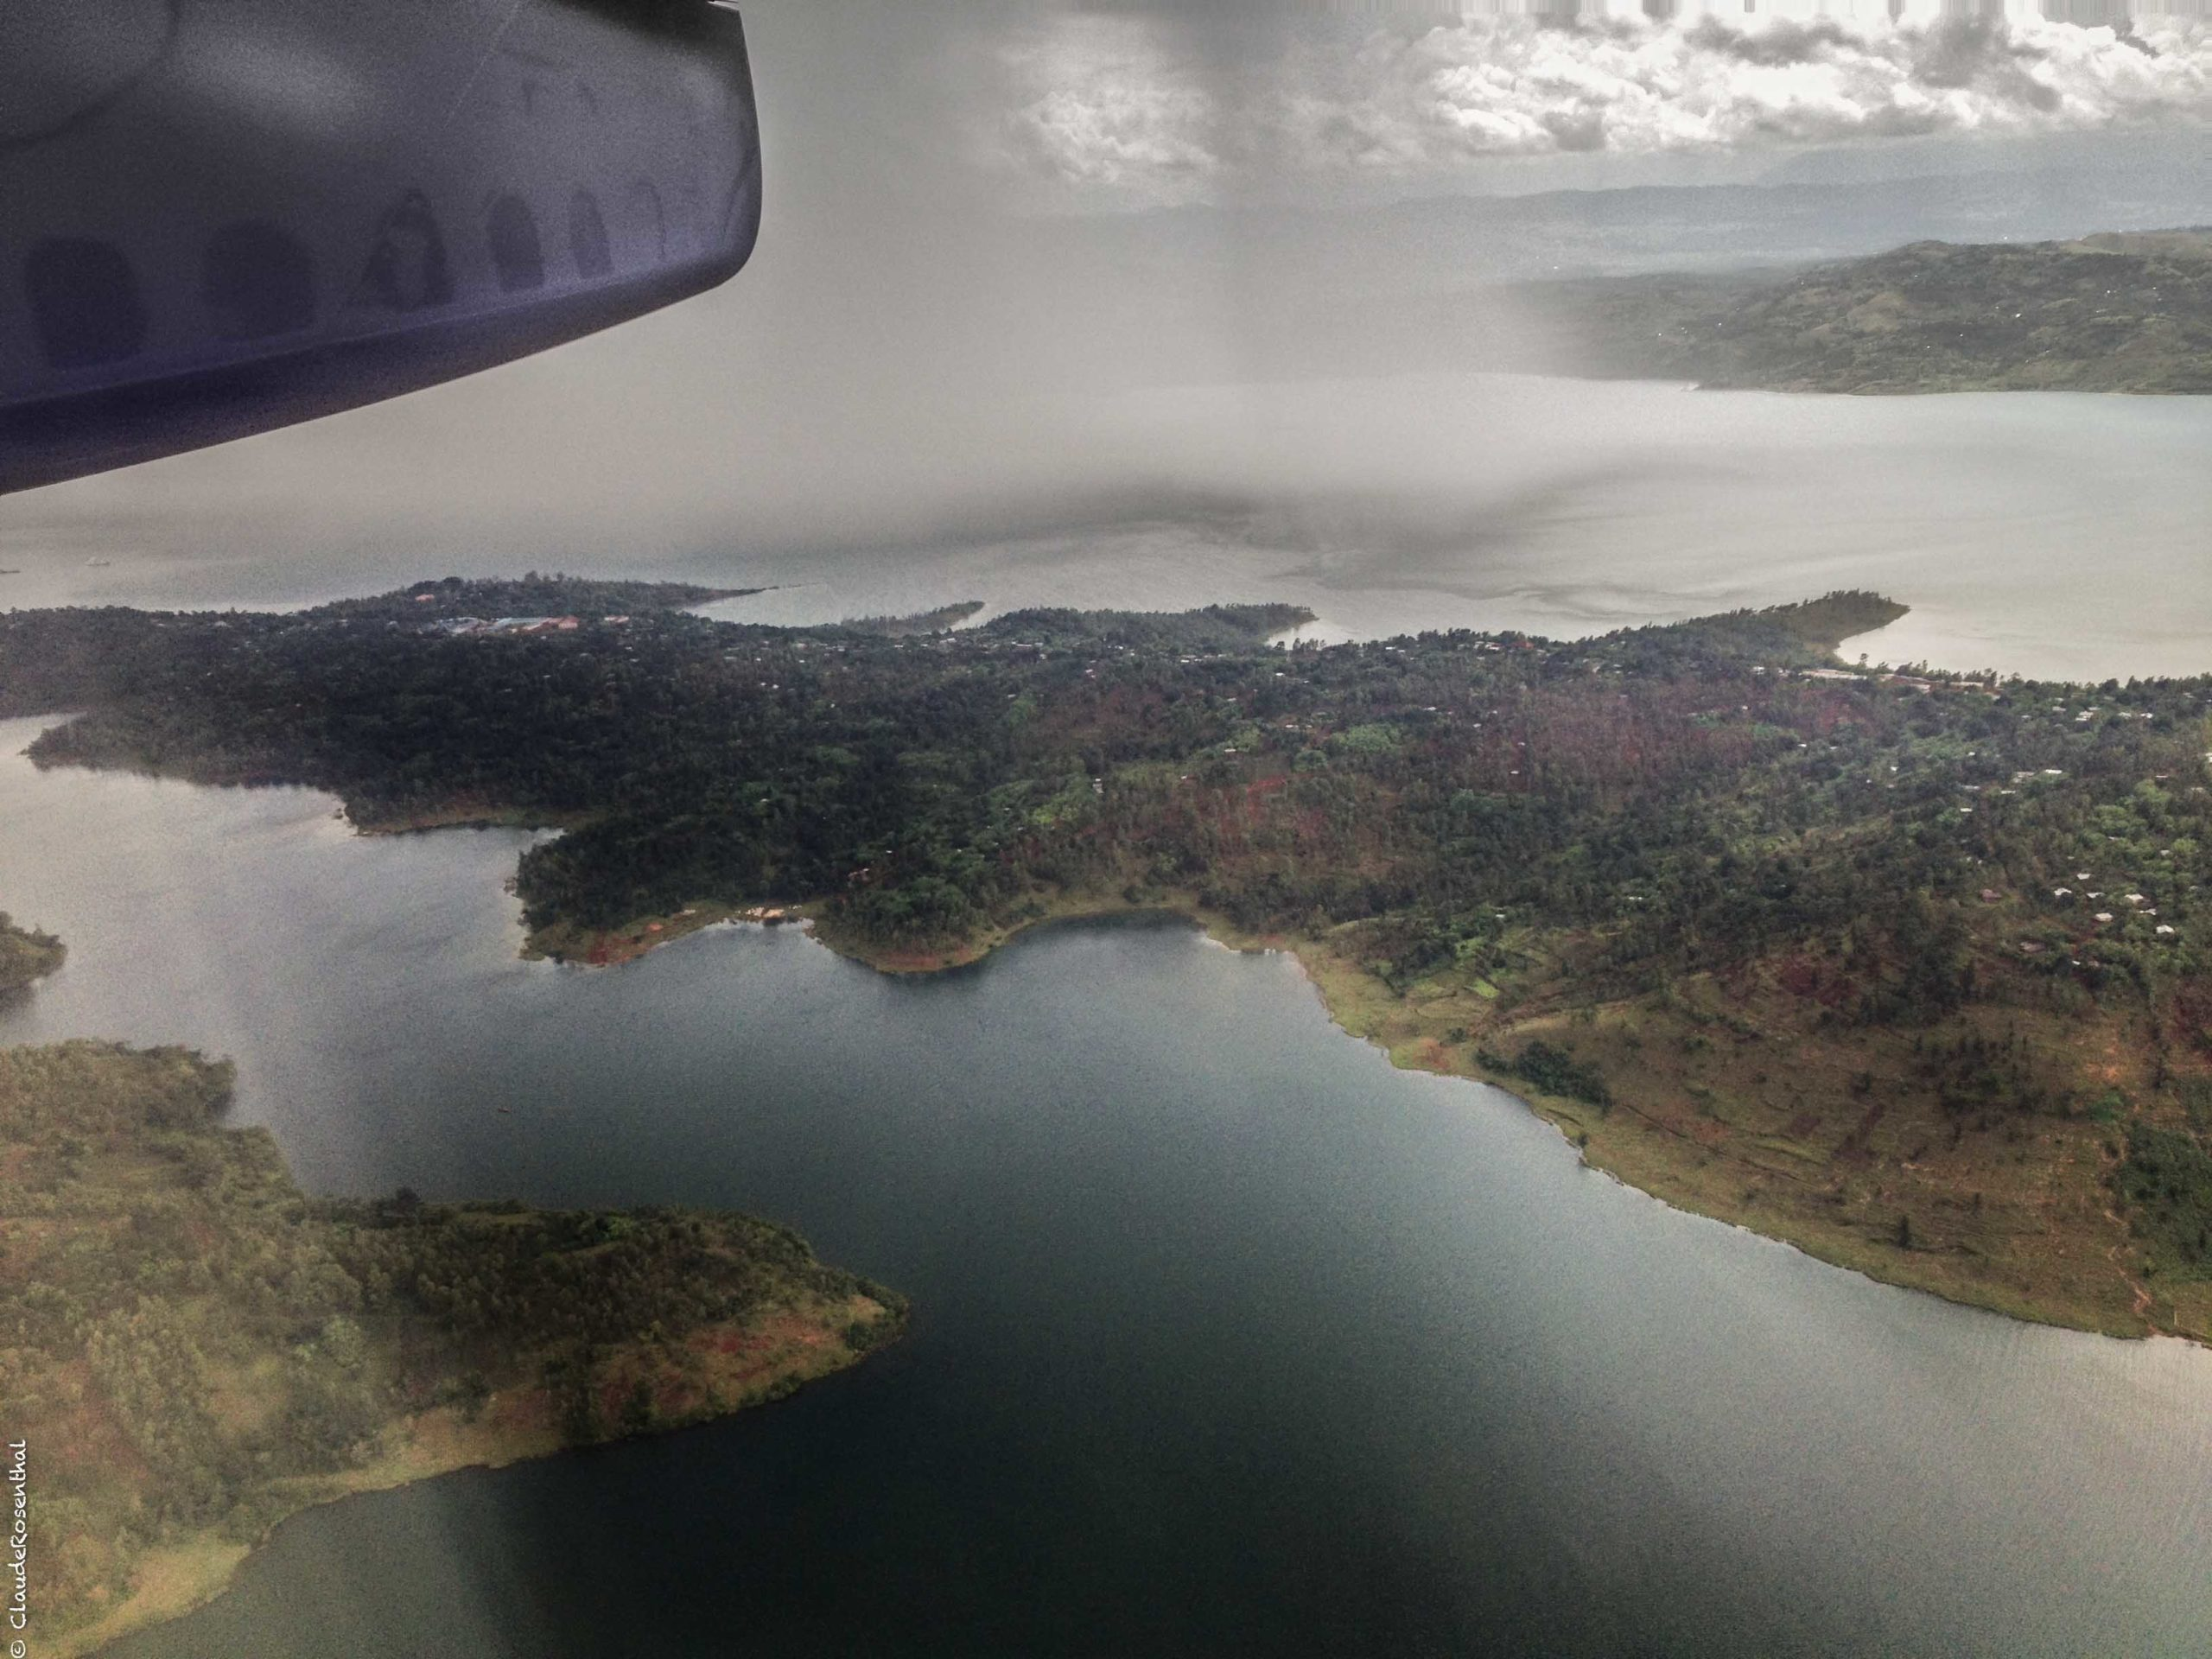 Arrivée sur Bukavu avion 1